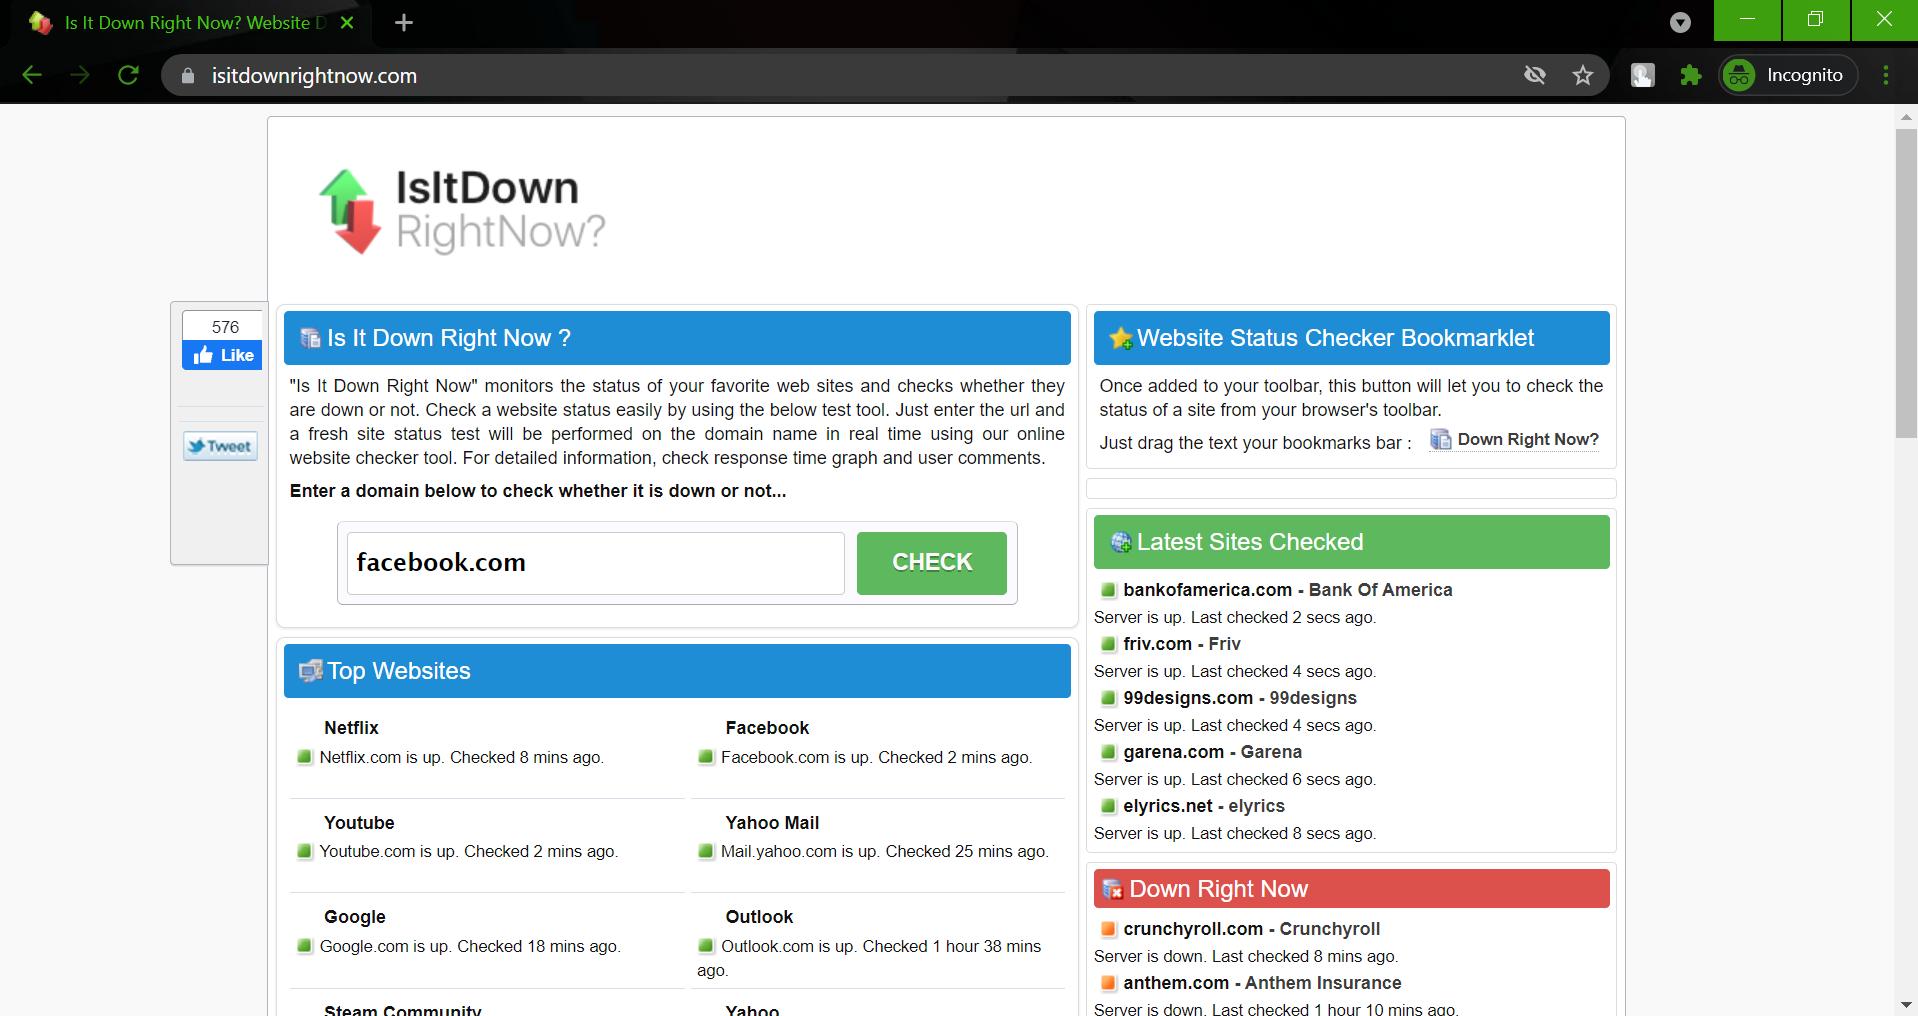 Hidden websites - isitdownrightnow.com